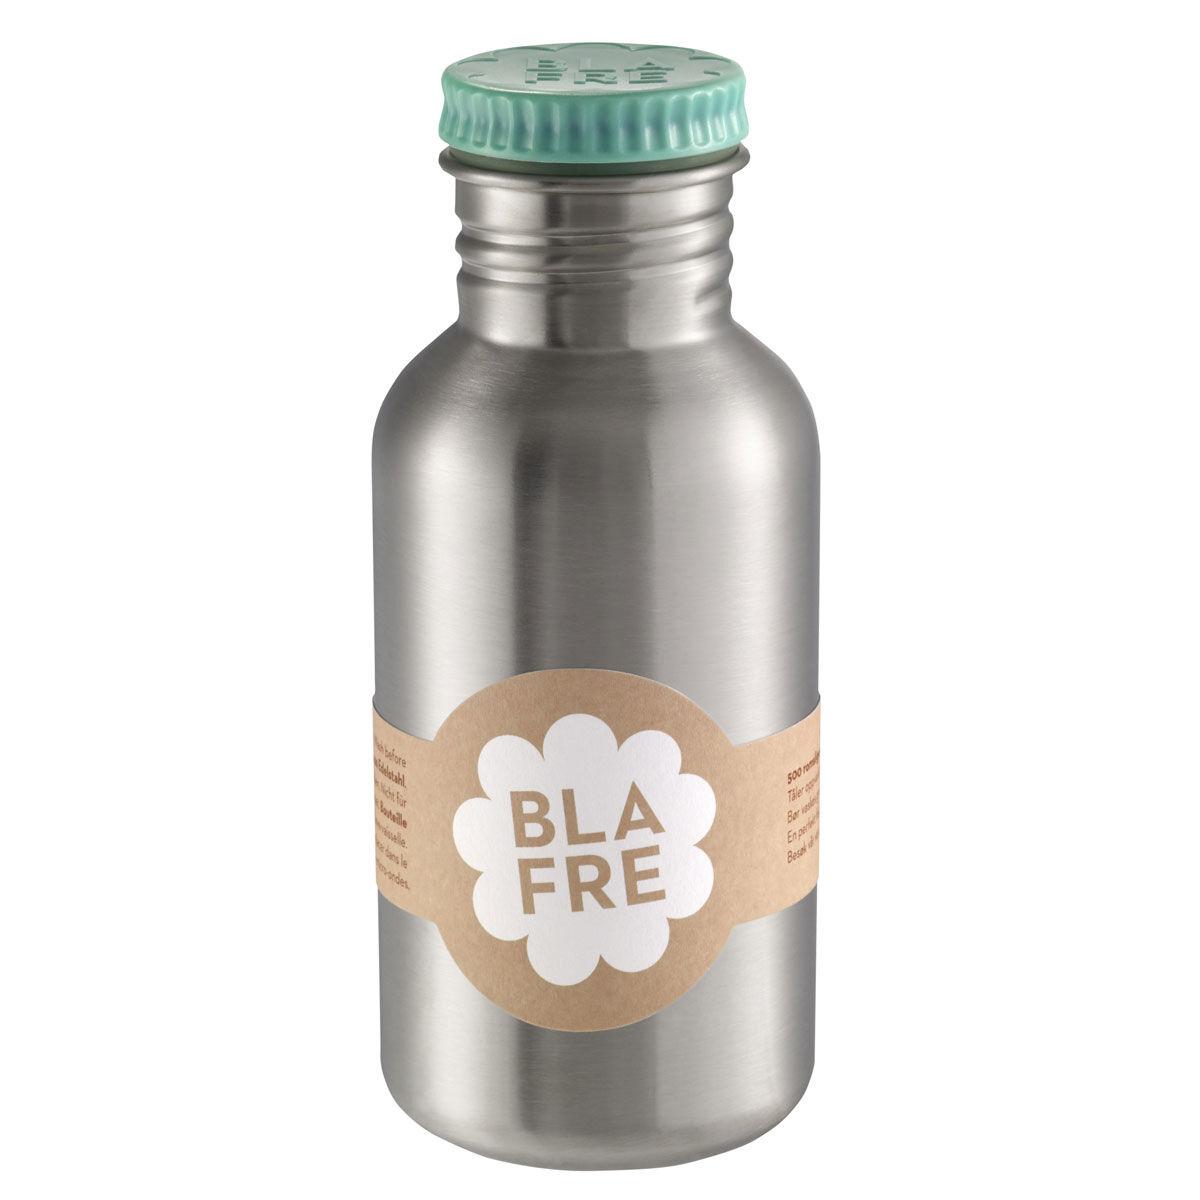 Blafre stålflaske til barn 500 ml. blågrønn